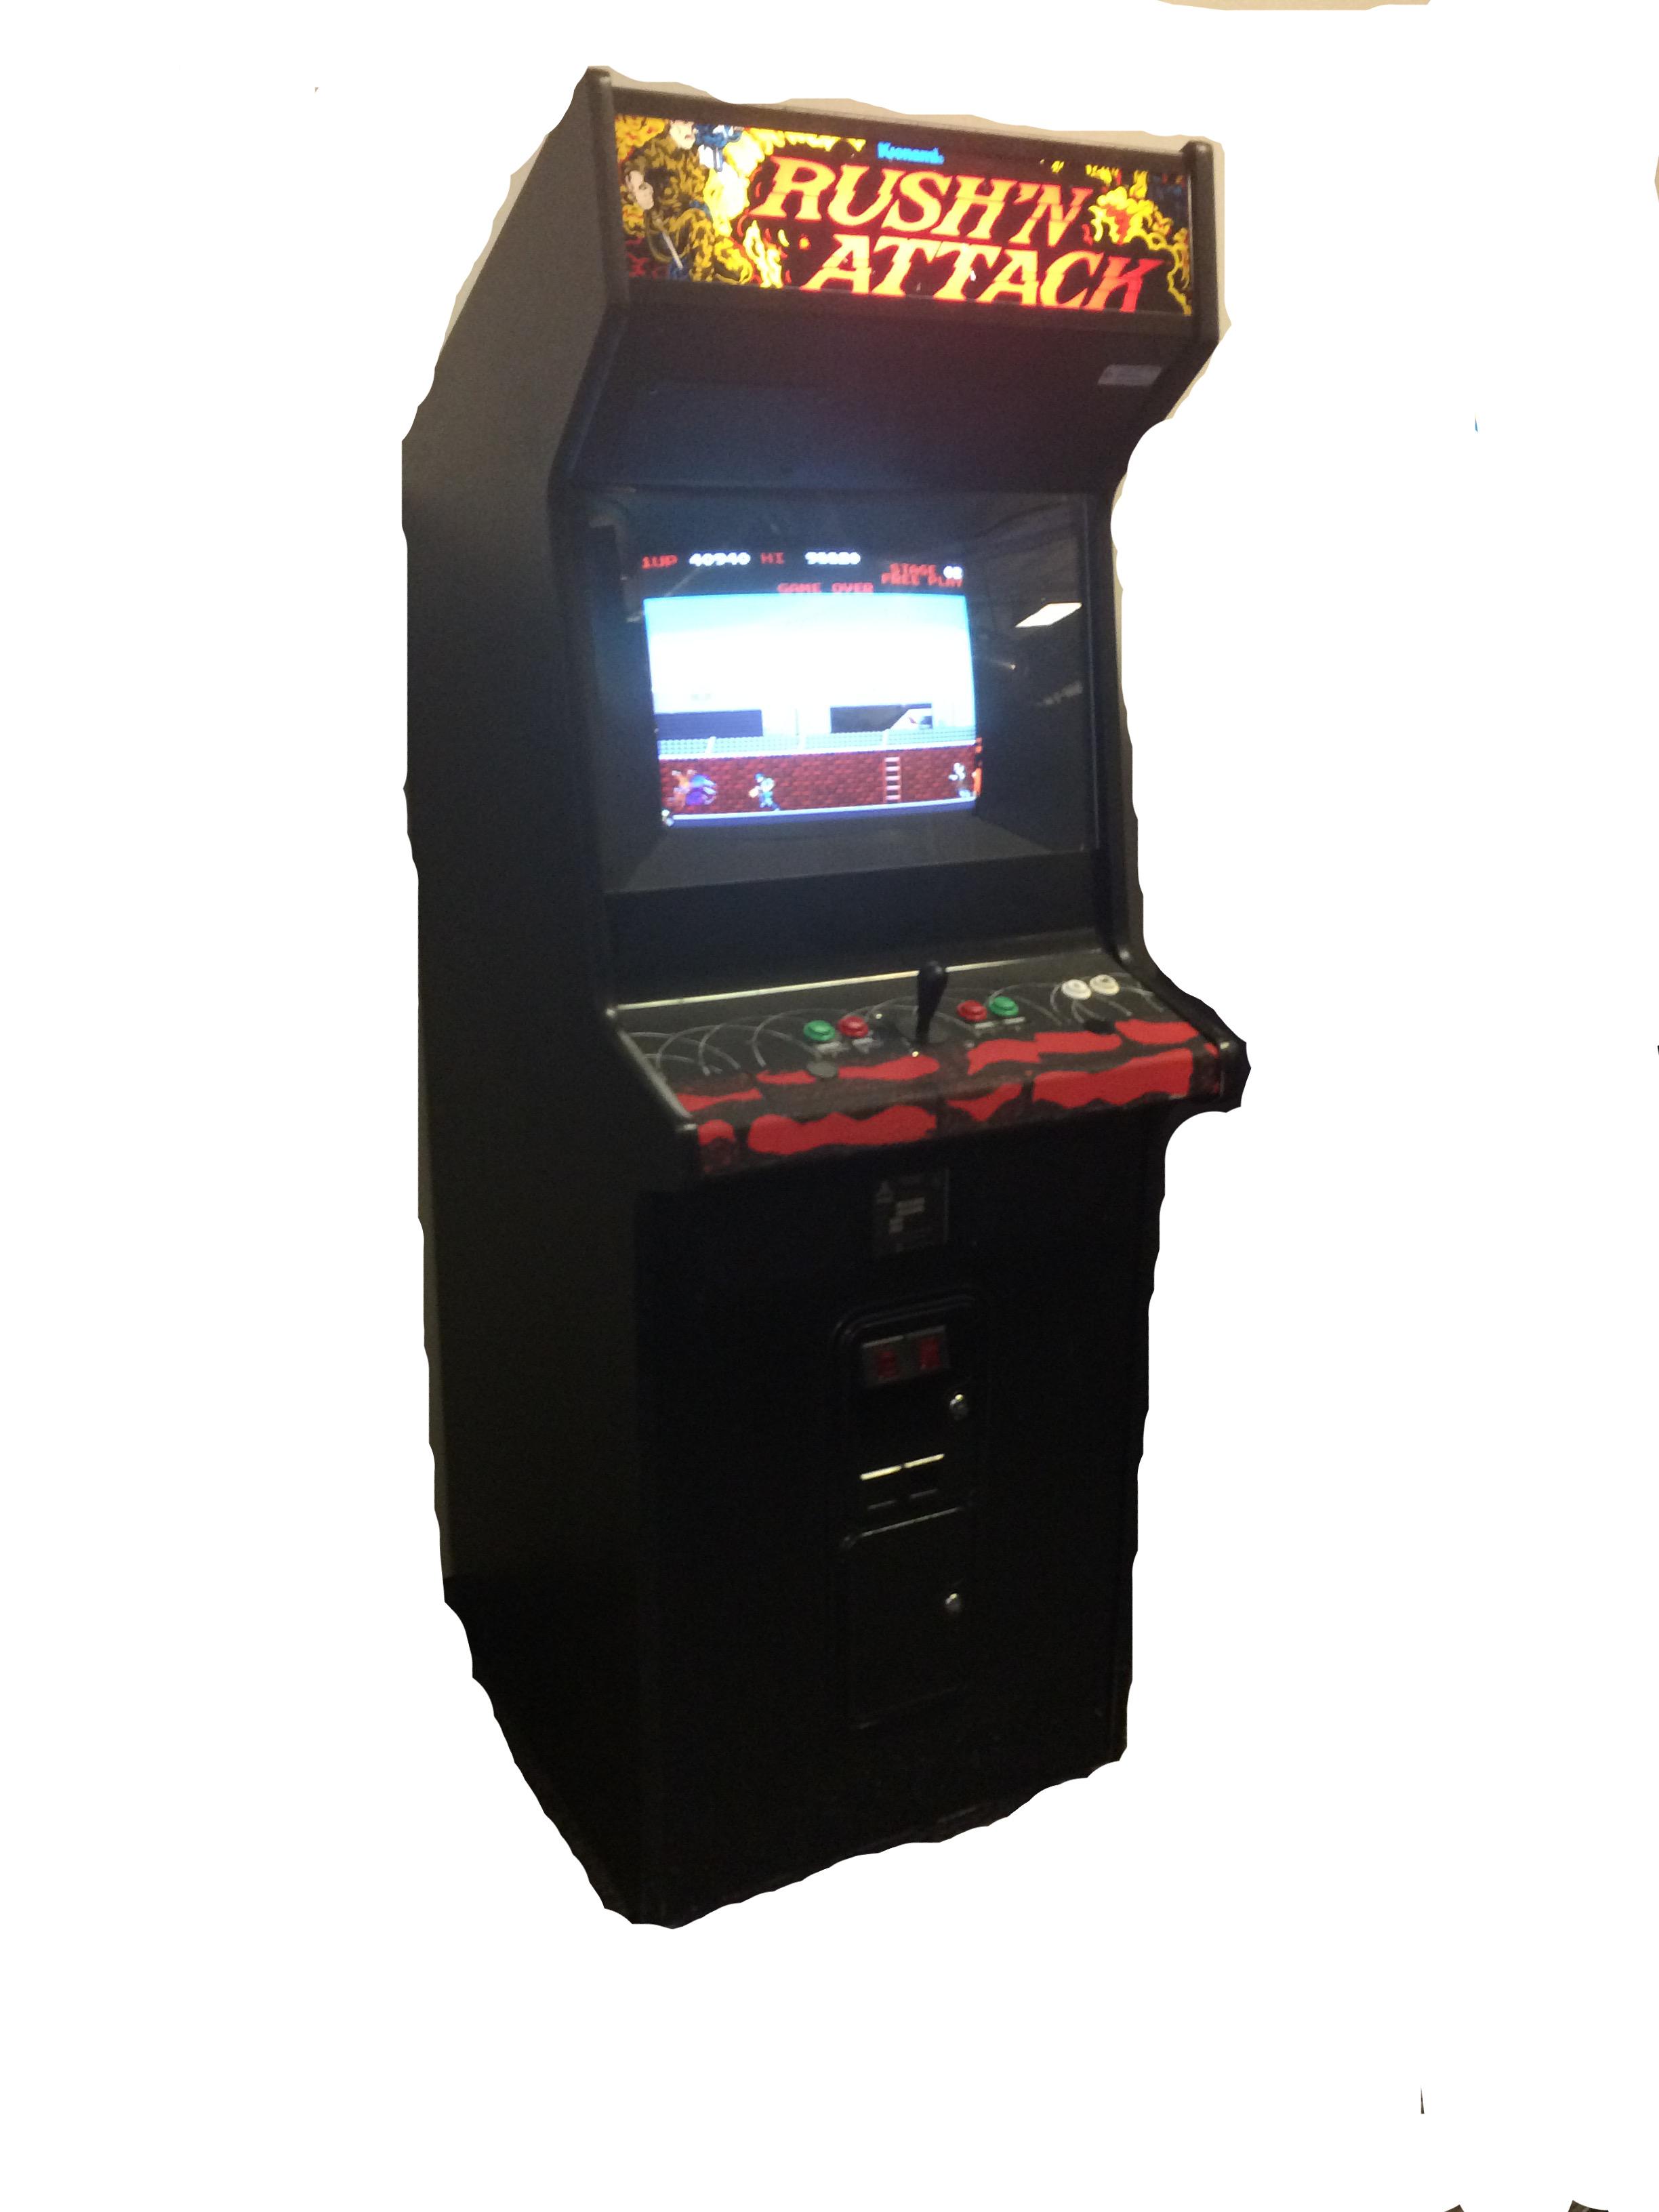 Rush N Attack Vintage Arcade Superstore